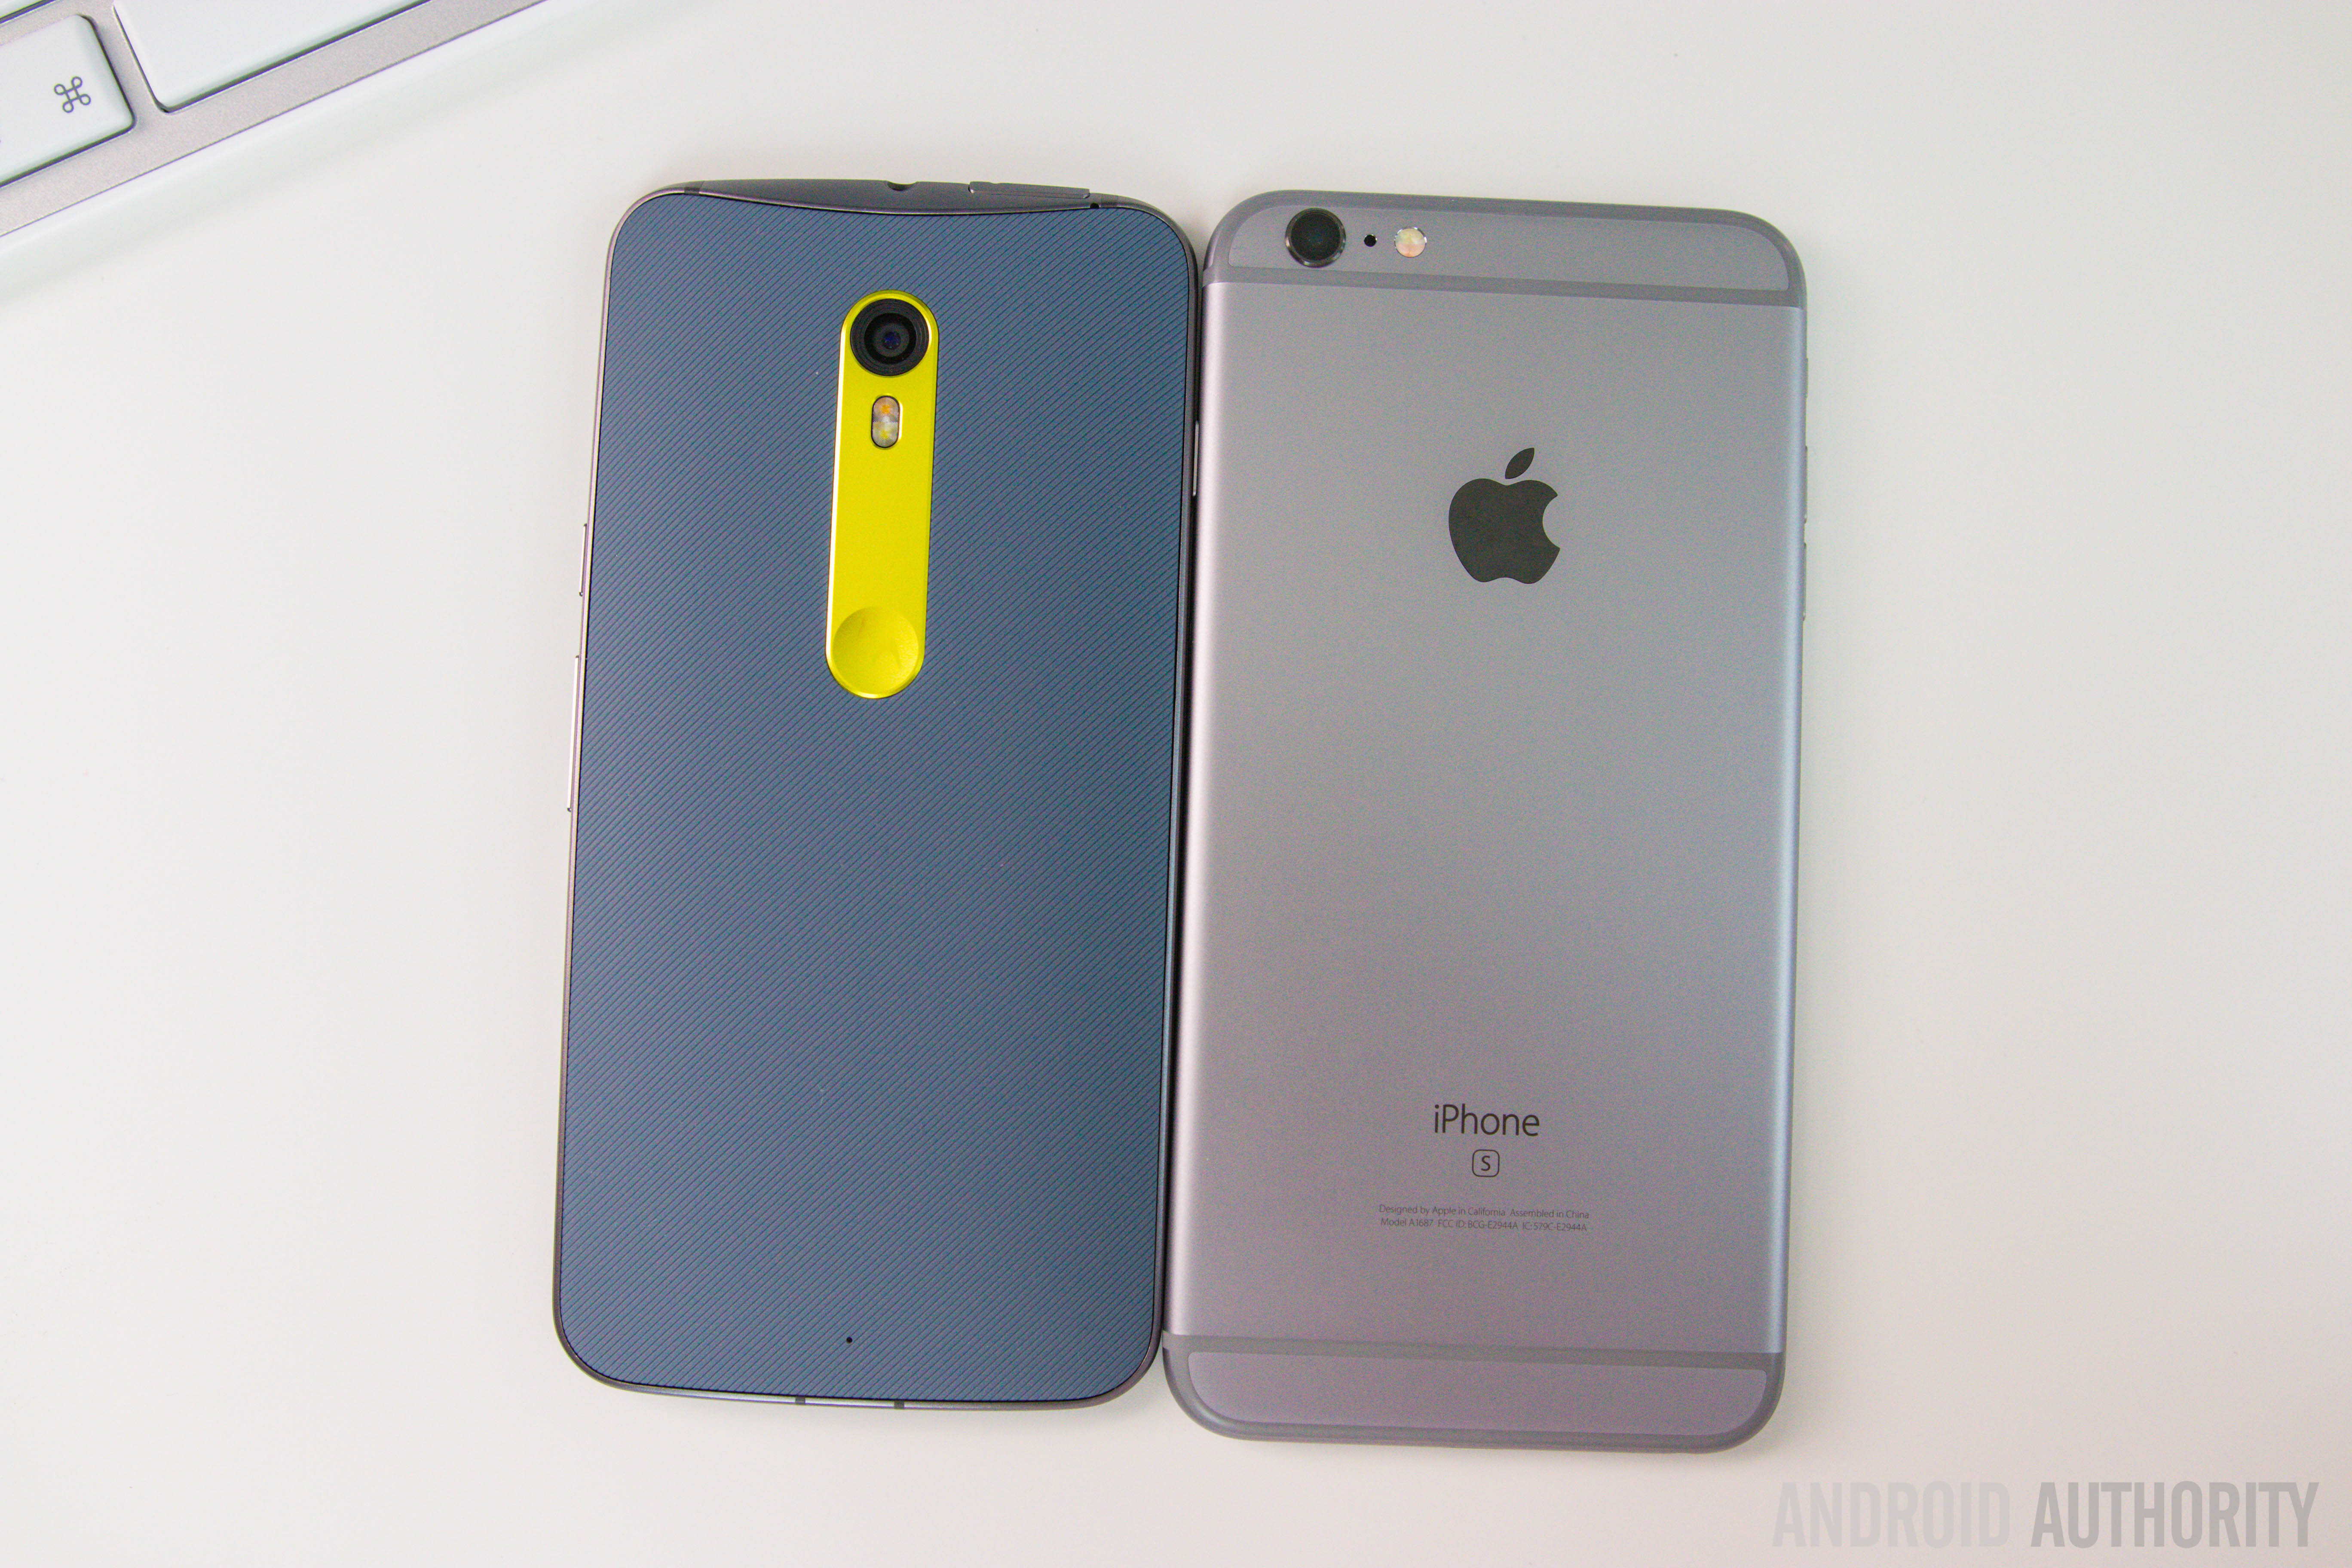 Moto X Pure Edition Vs iPhone 6S Plus-22